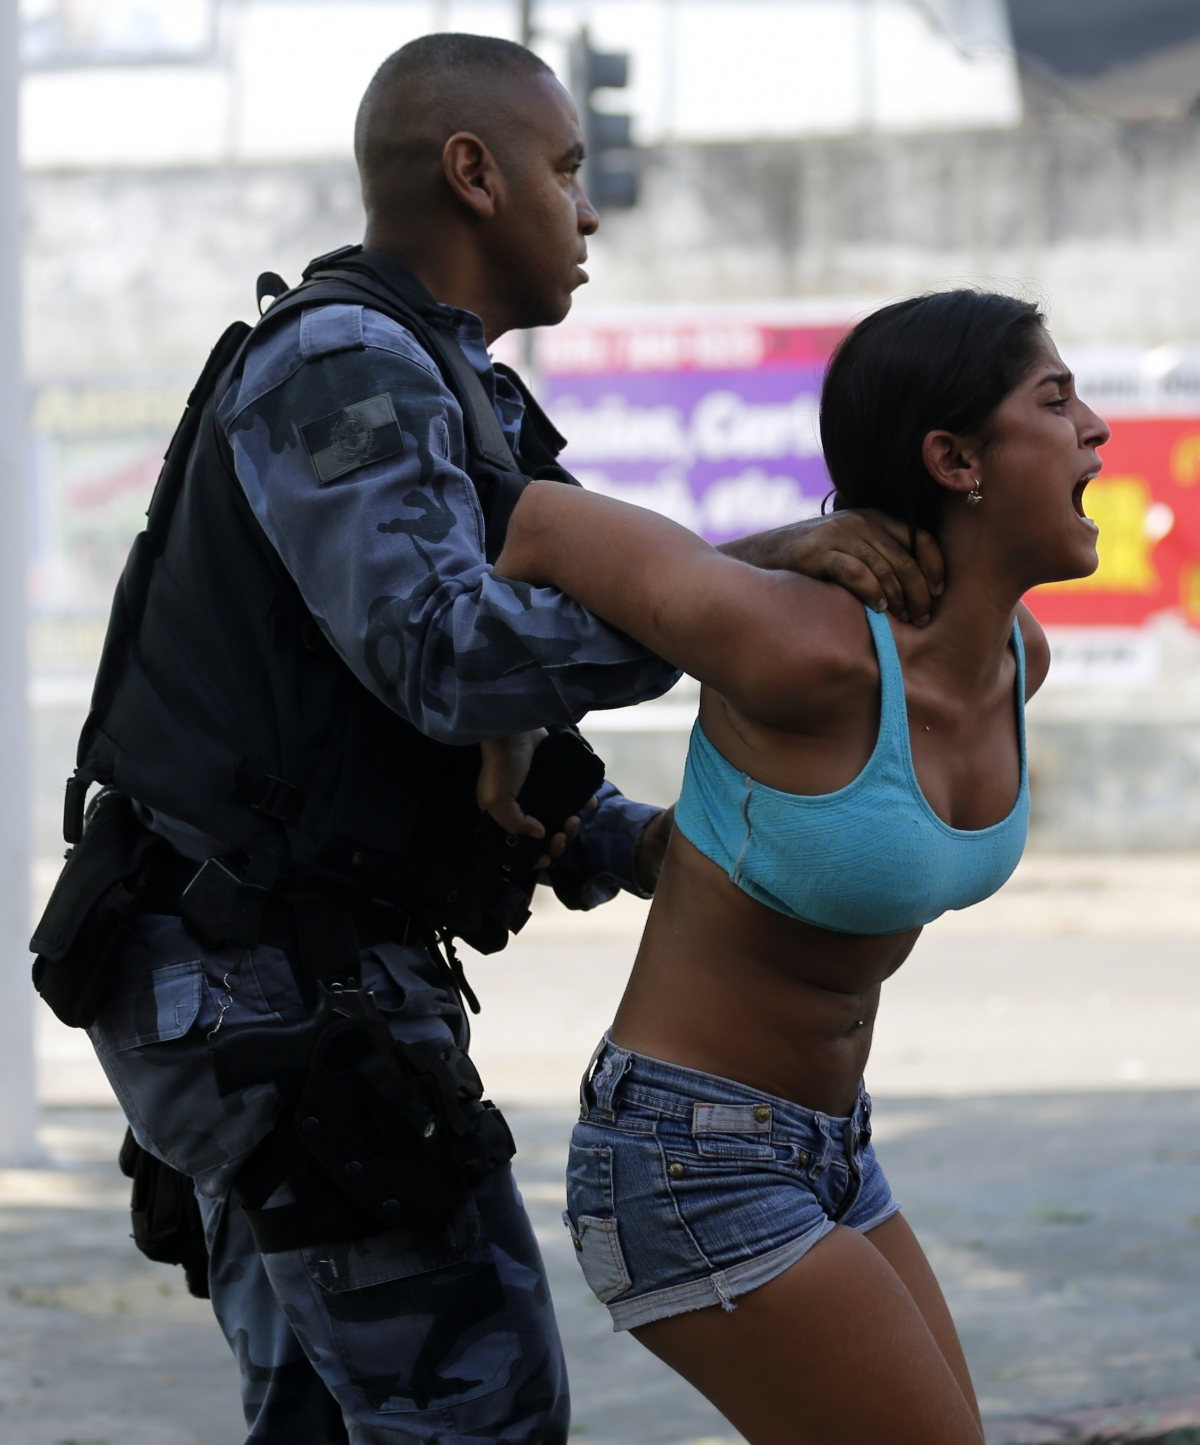 A riot policeman arrests a demonstrator from a favela in Rio de Janeiro